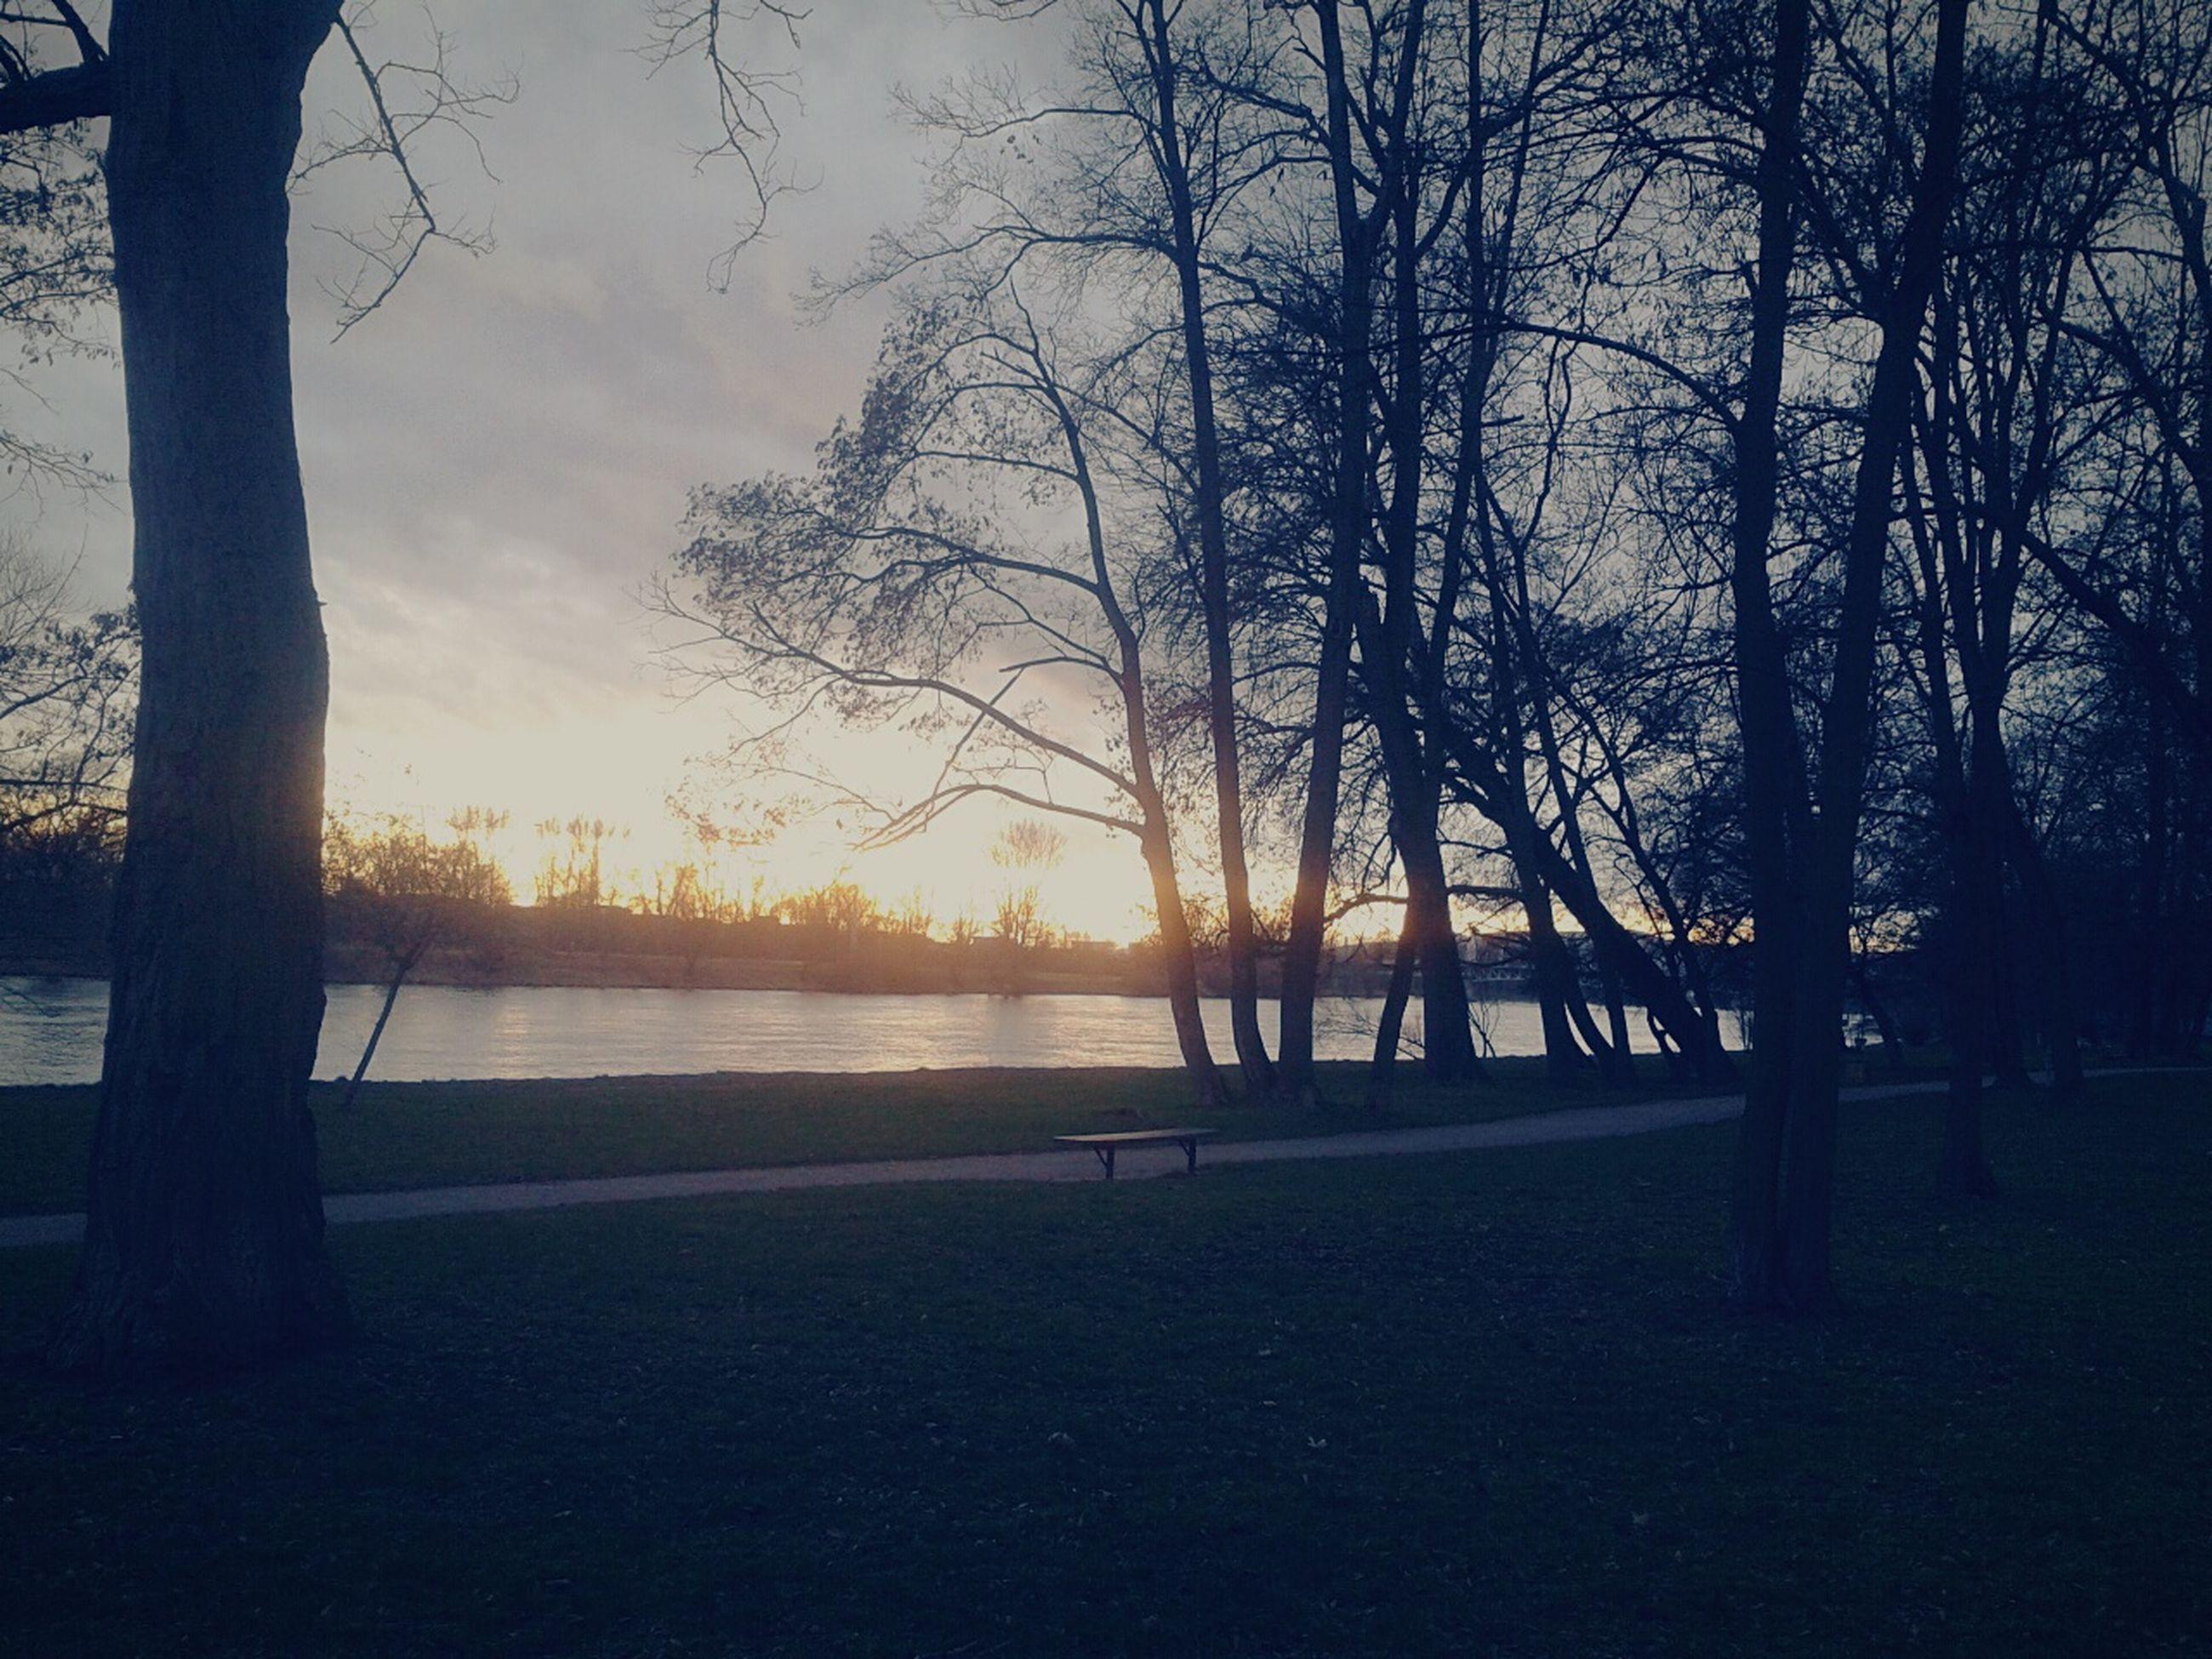 sunset, tree, silhouette, tranquility, tranquil scene, scenics, beauty in nature, water, sky, nature, tree trunk, bare tree, idyllic, branch, sun, sunlight, lake, orange color, outdoors, non-urban scene